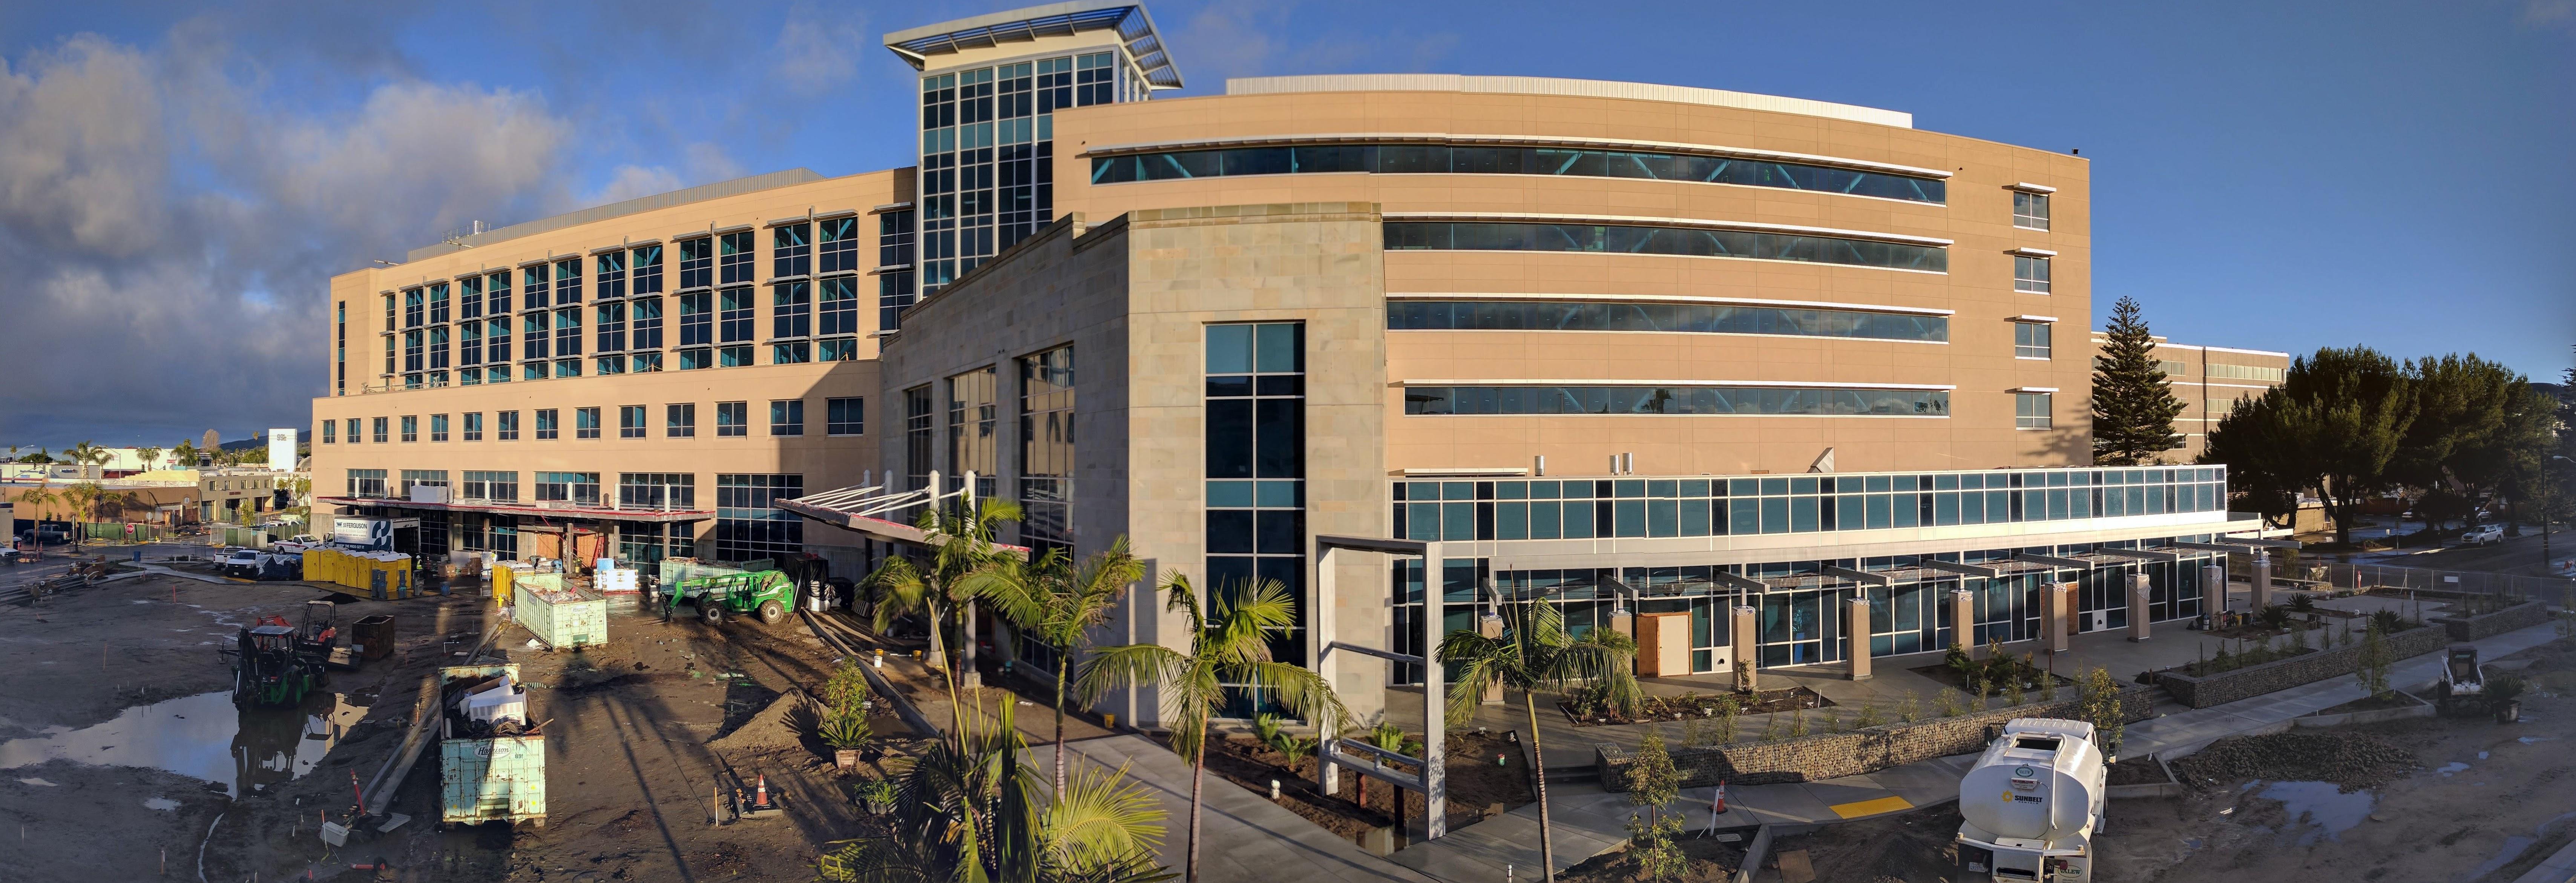 Community Memorial Hospital of San Buenaventura - Wikipedia